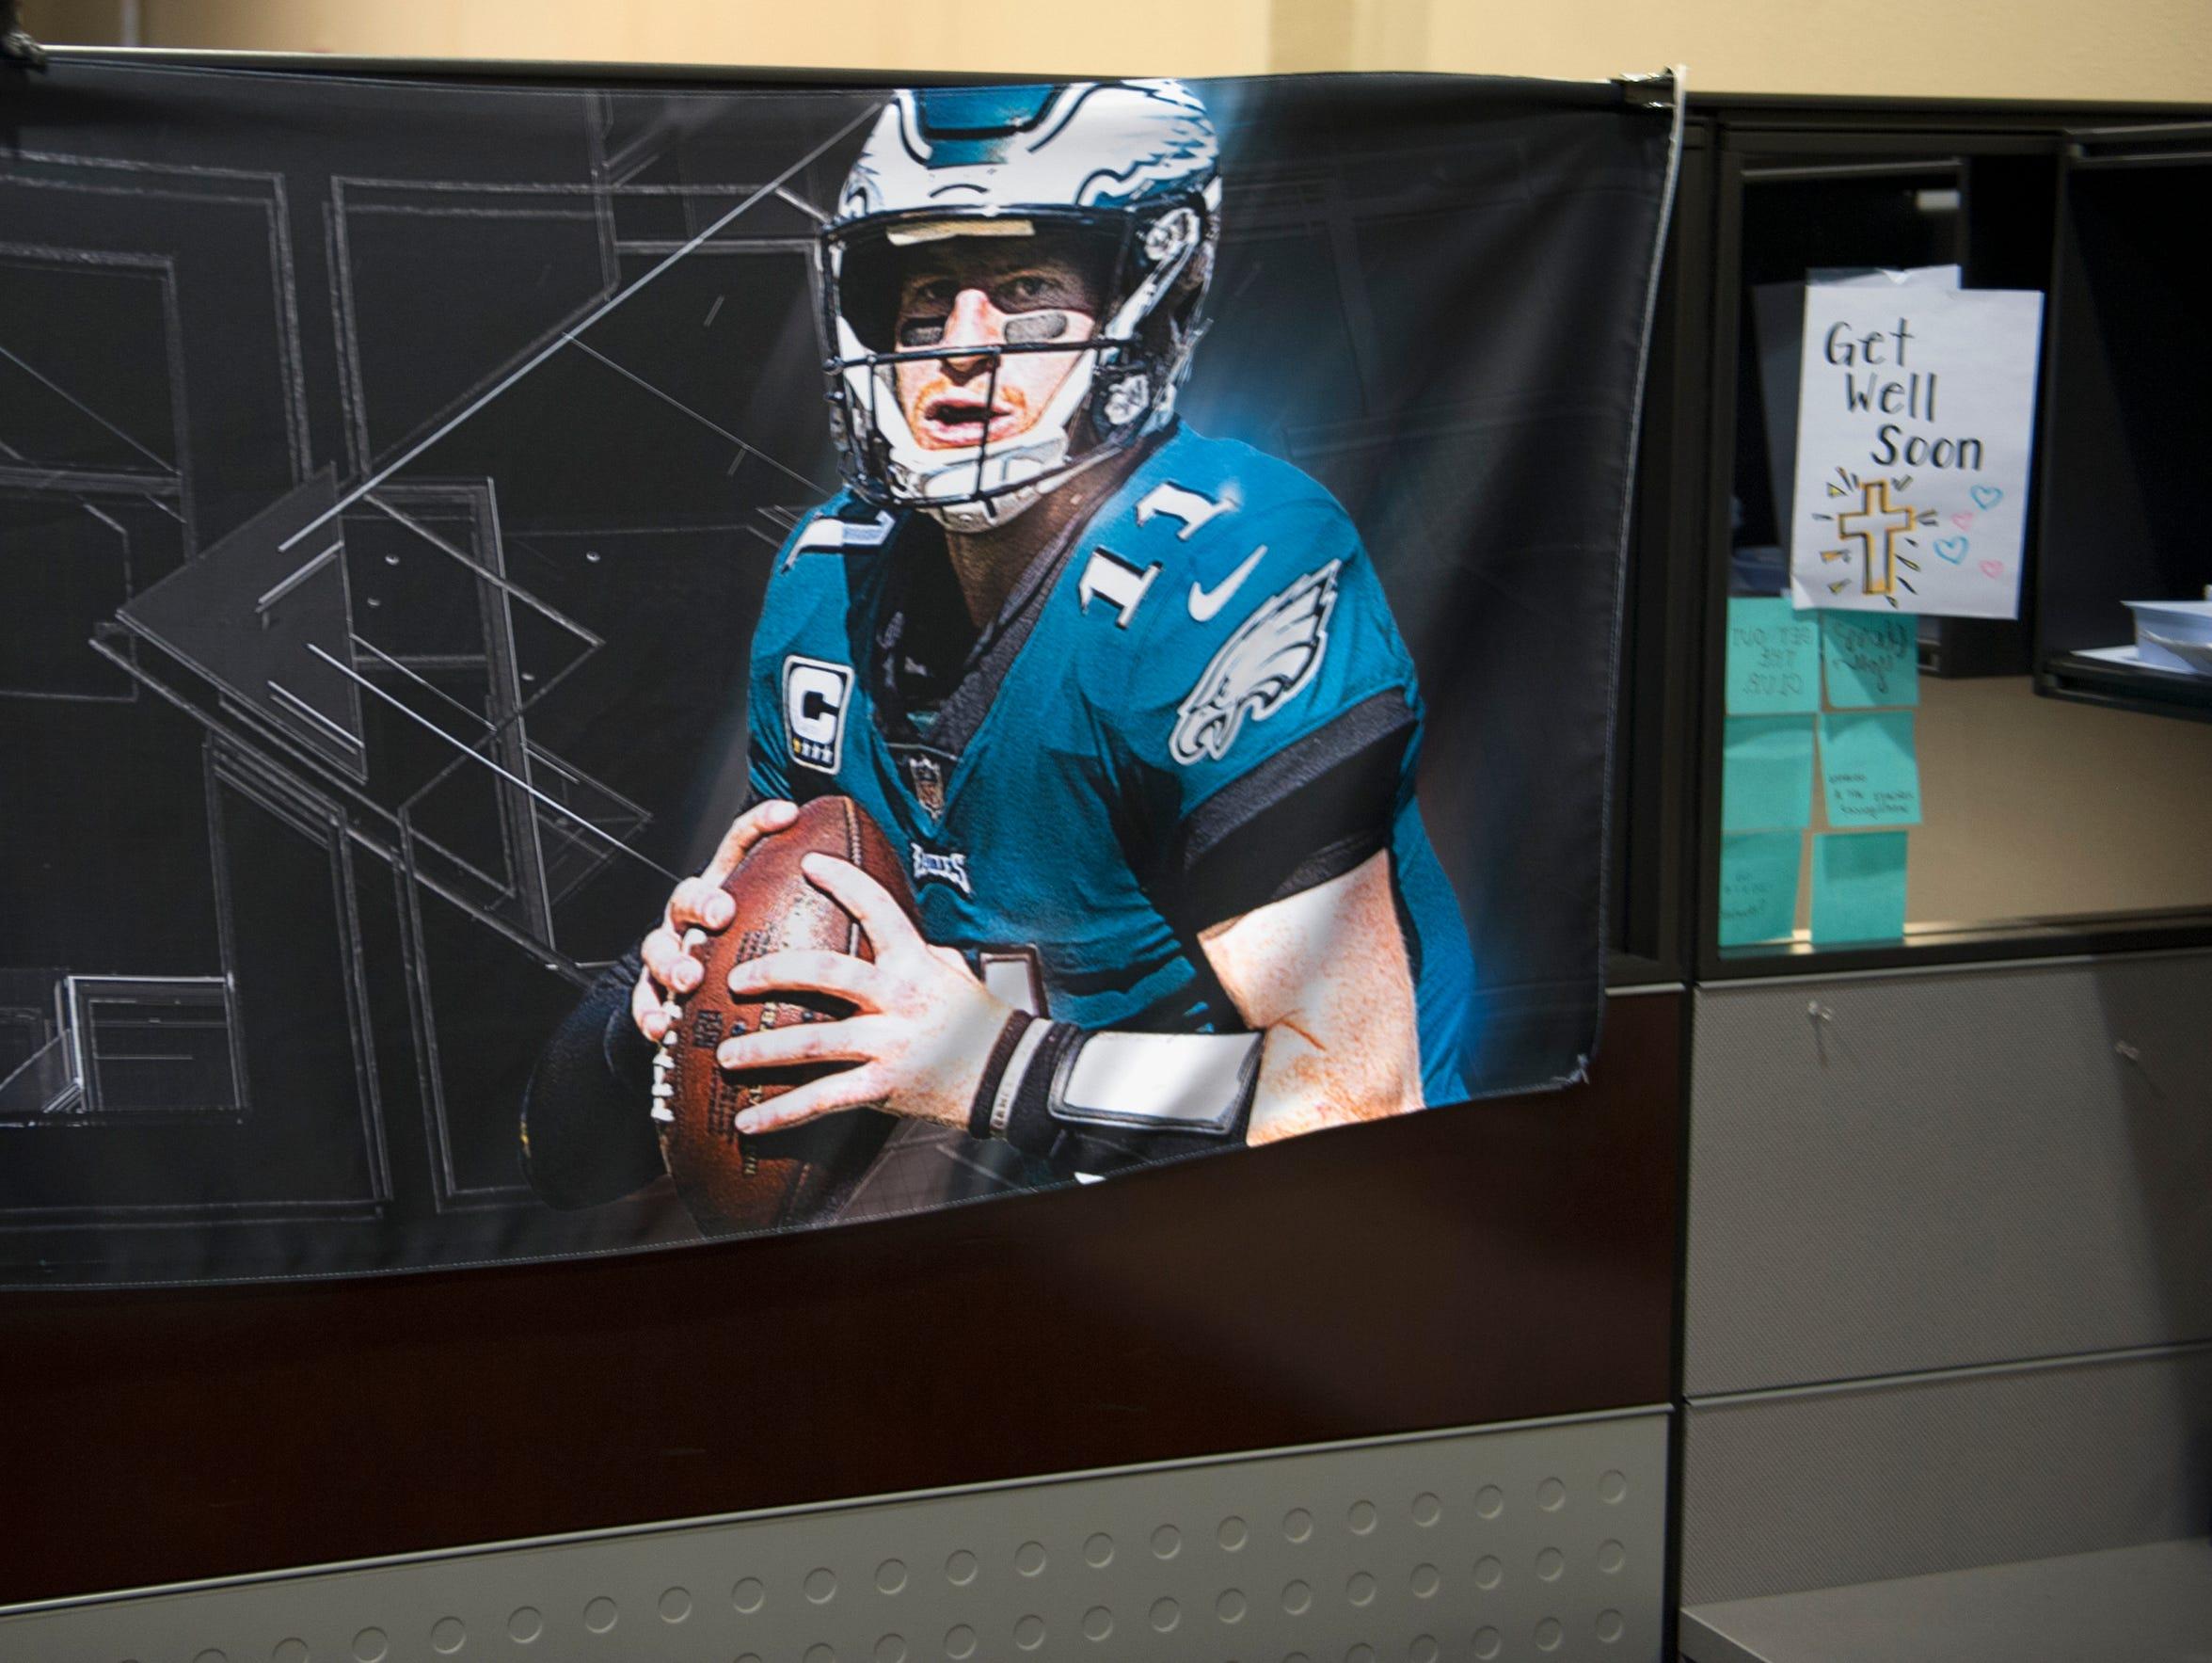 A photograph of Eagles quarterback Carson Wentz hangs